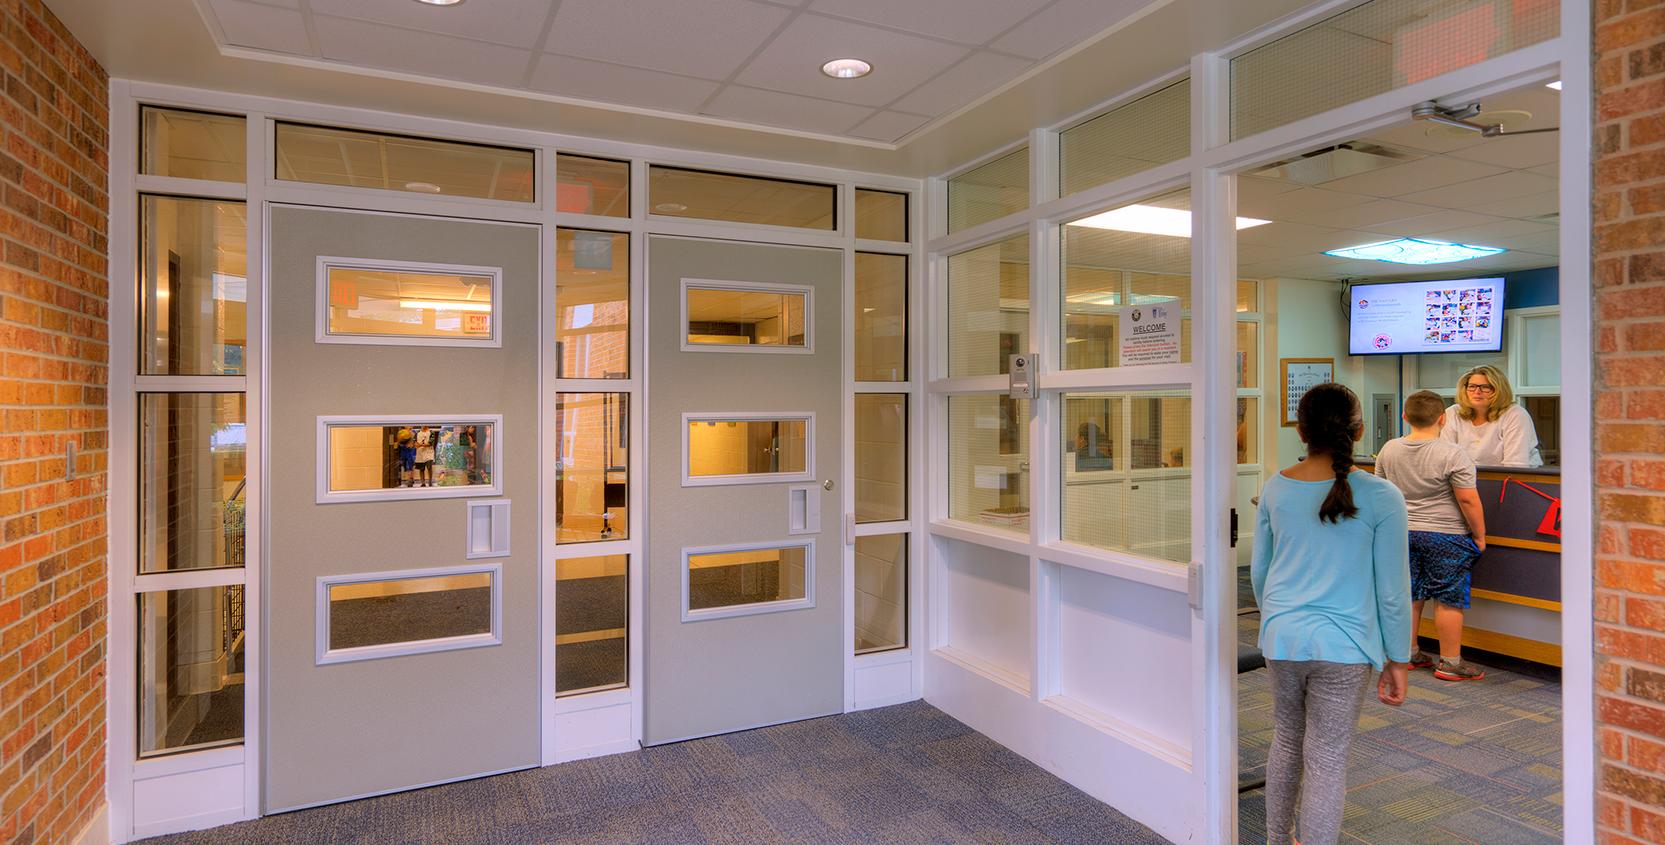 Troy-Public-Schools-School-Secure-Entrance_1665x845